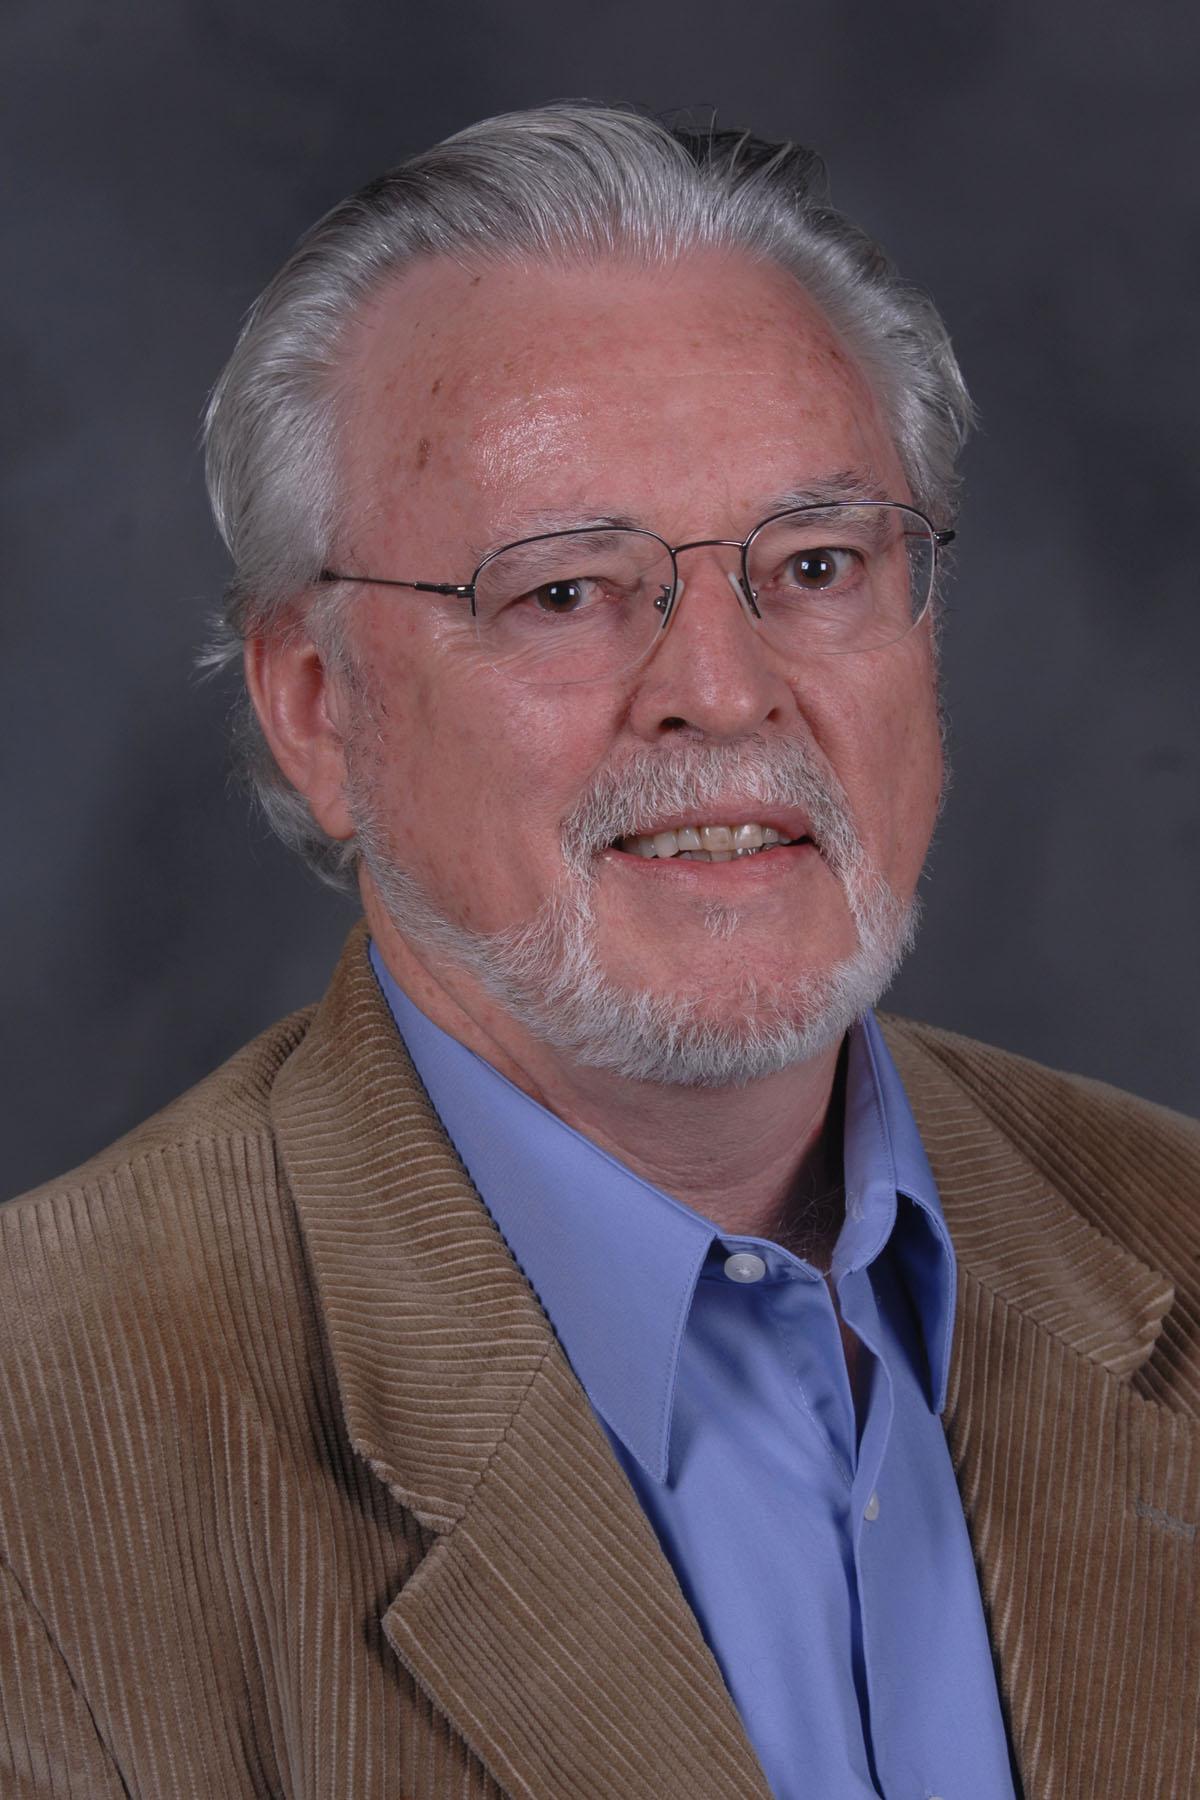 Kent State Professor Peter Tandy